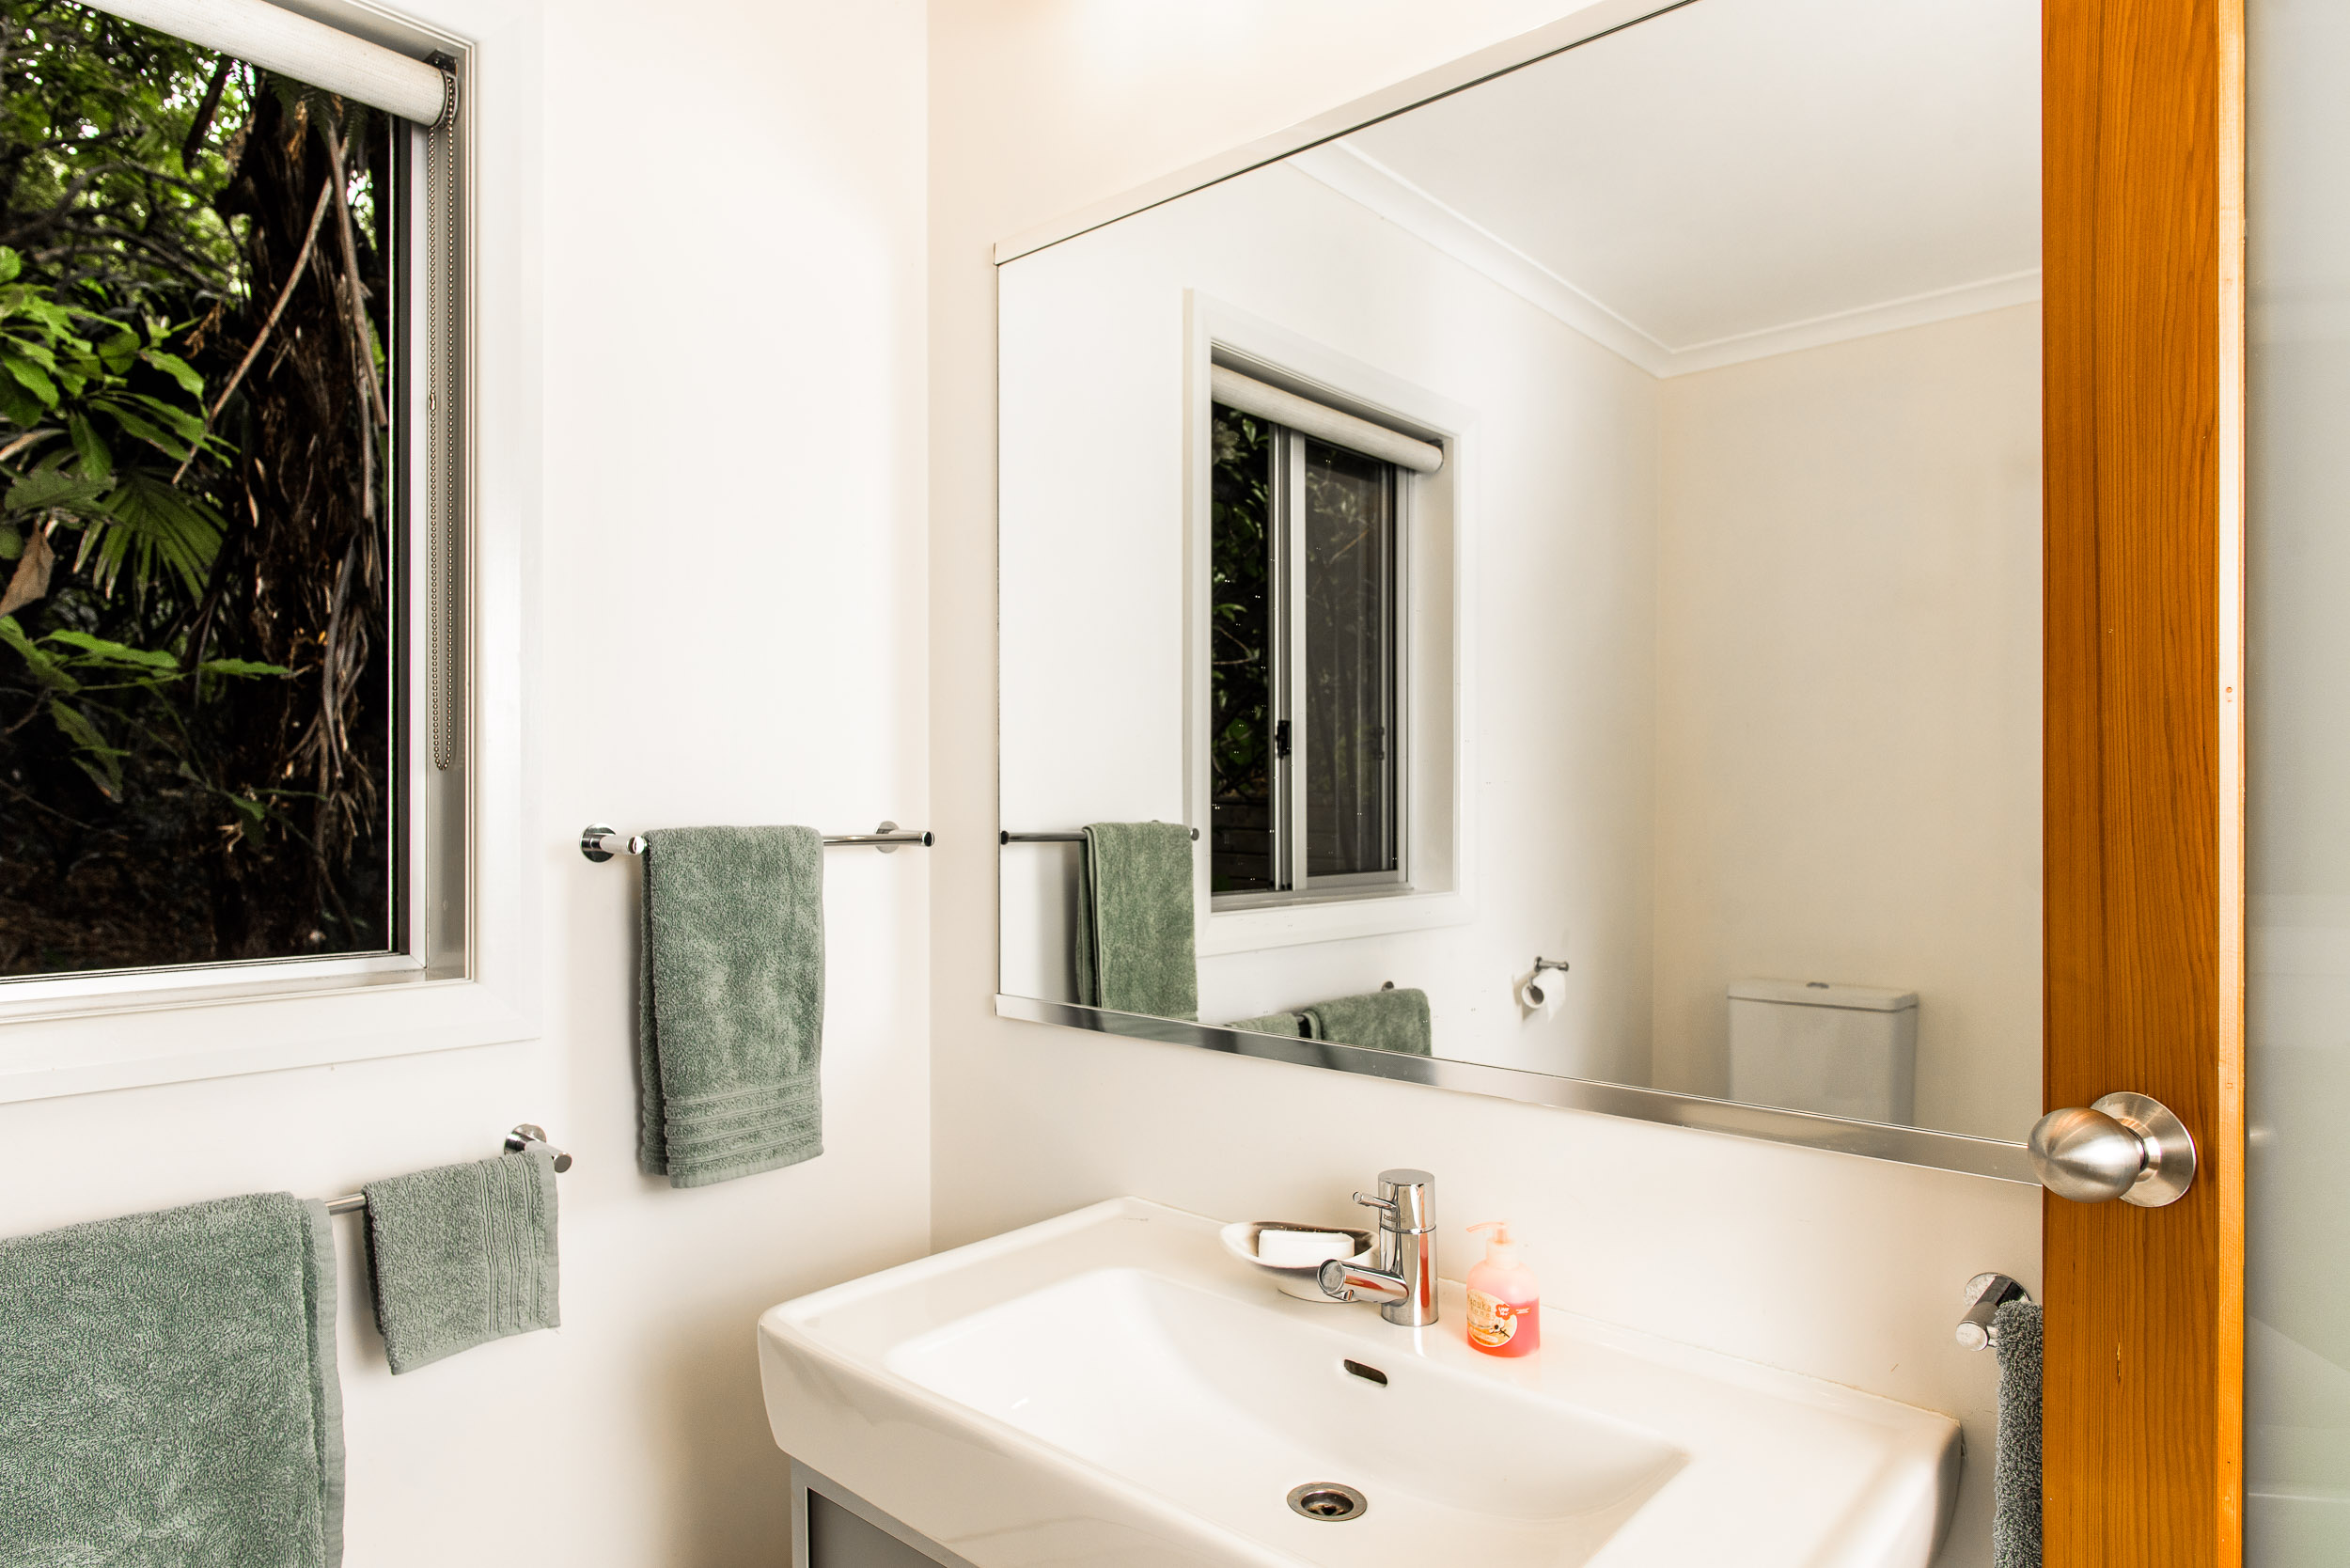 Aruhe Bathroom - 5190 - web.jpg